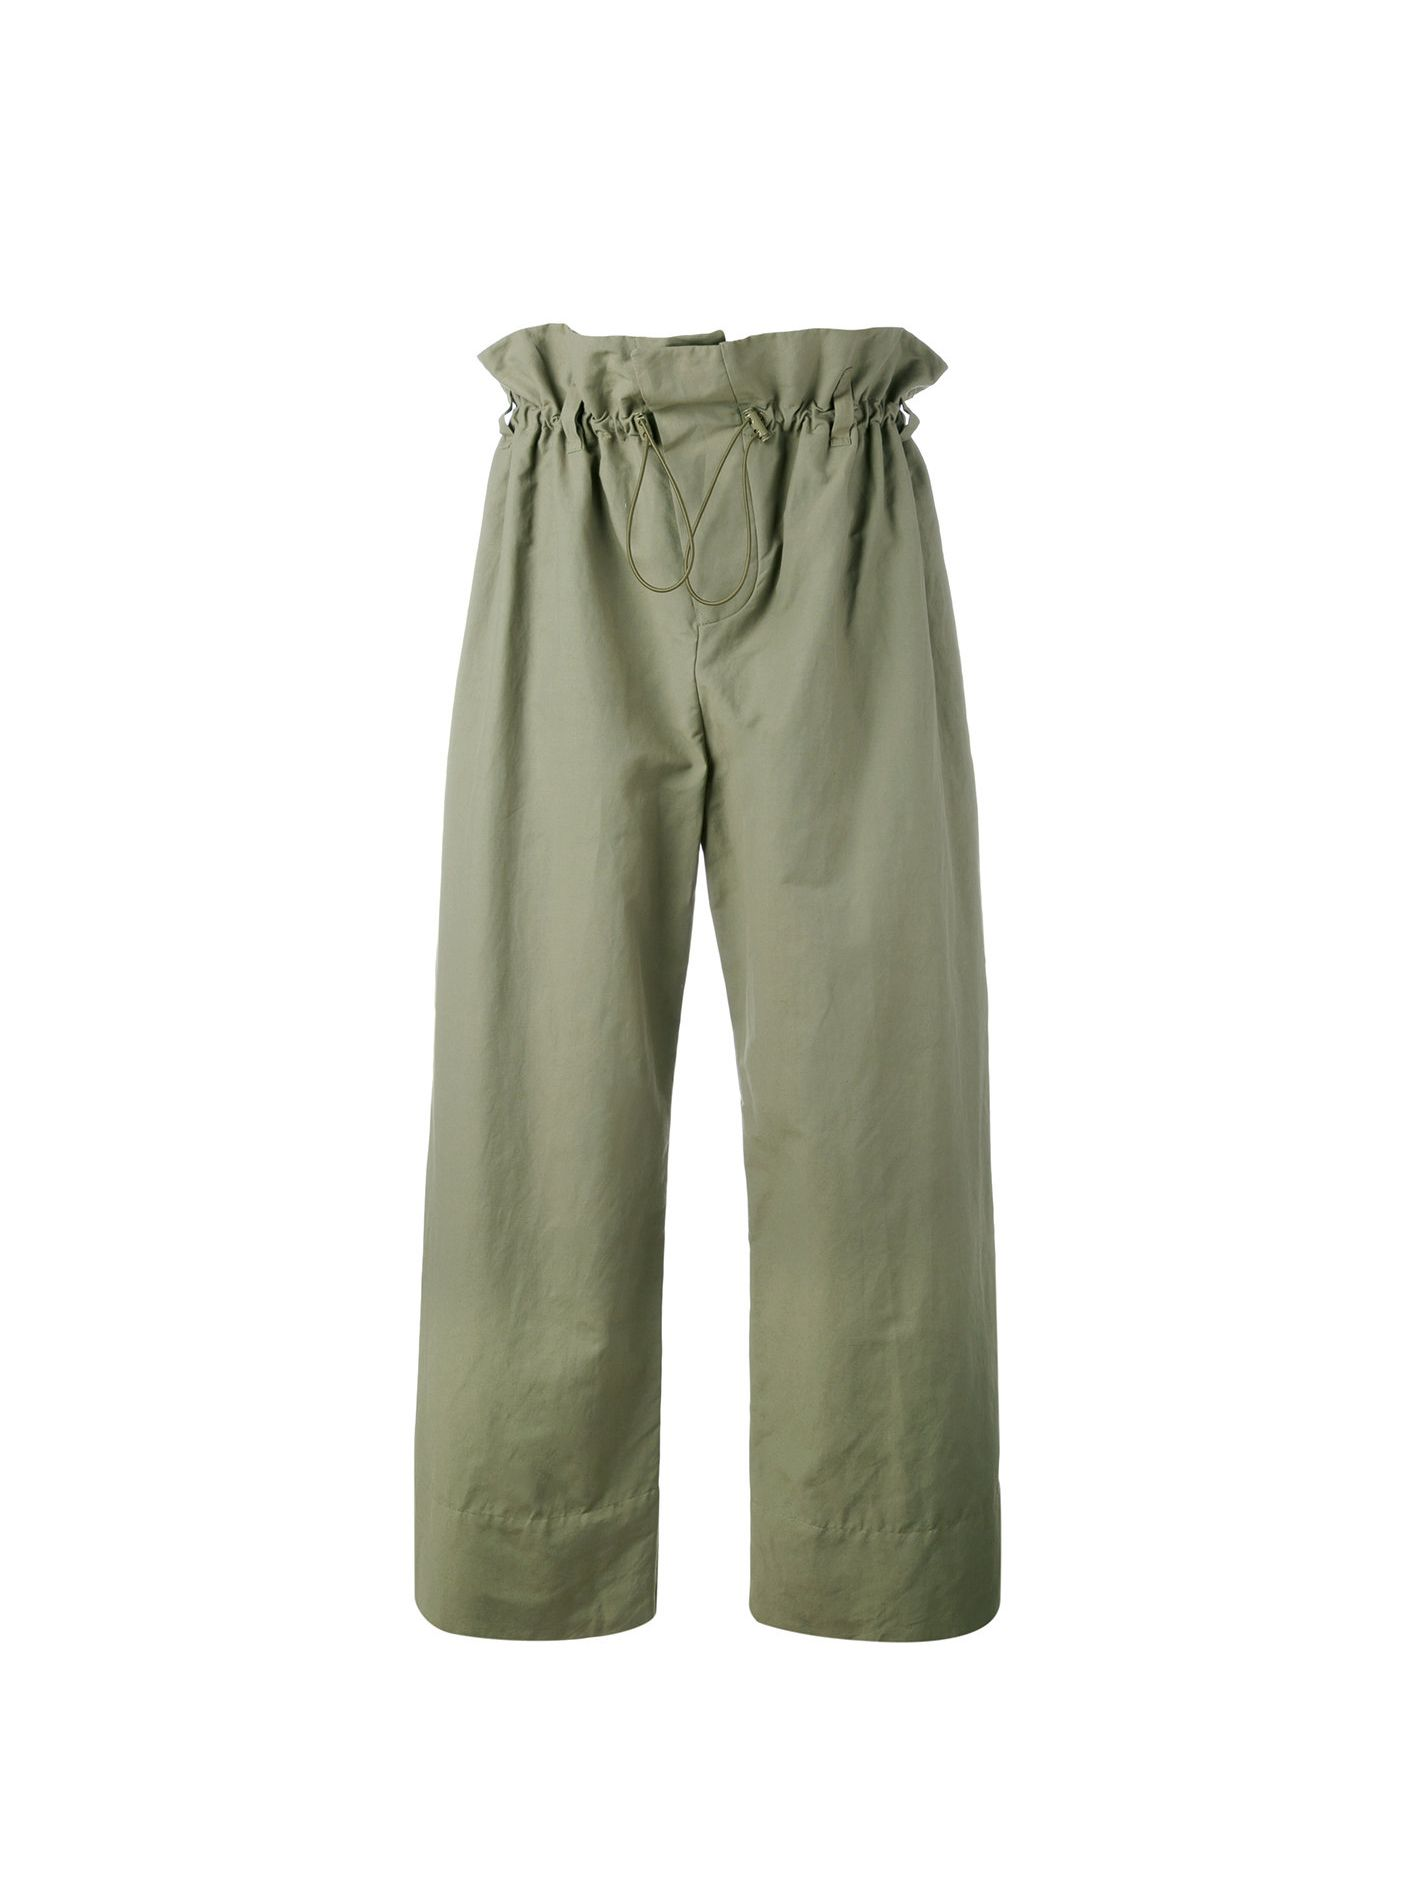 Corchetes Pantalon Zara Y Diplomatica Raya gtqxtv1w